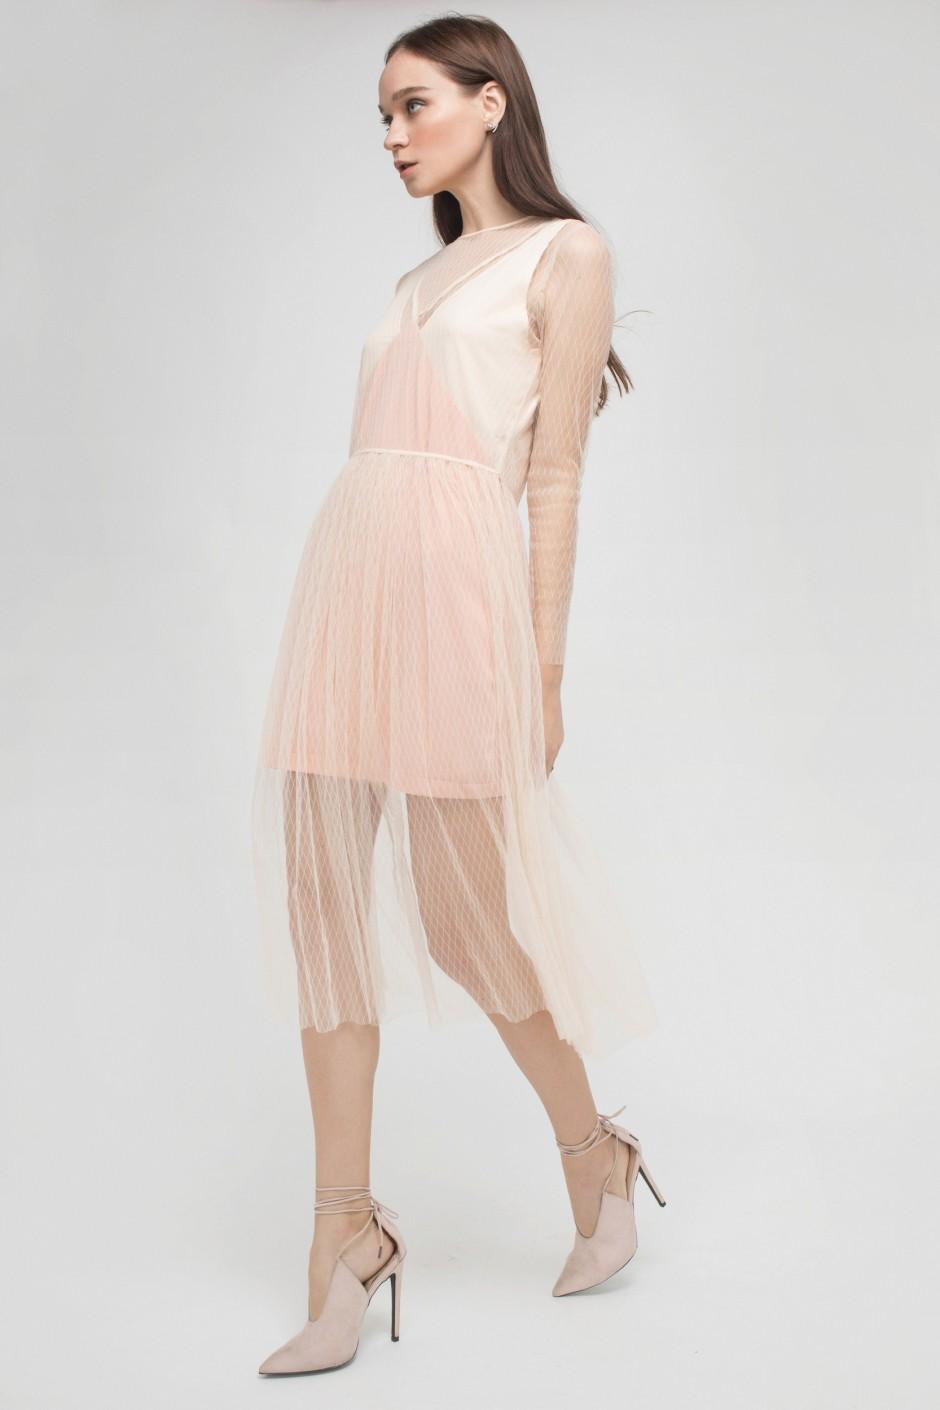 NUDE NET EDGY ROMANCE DRESS